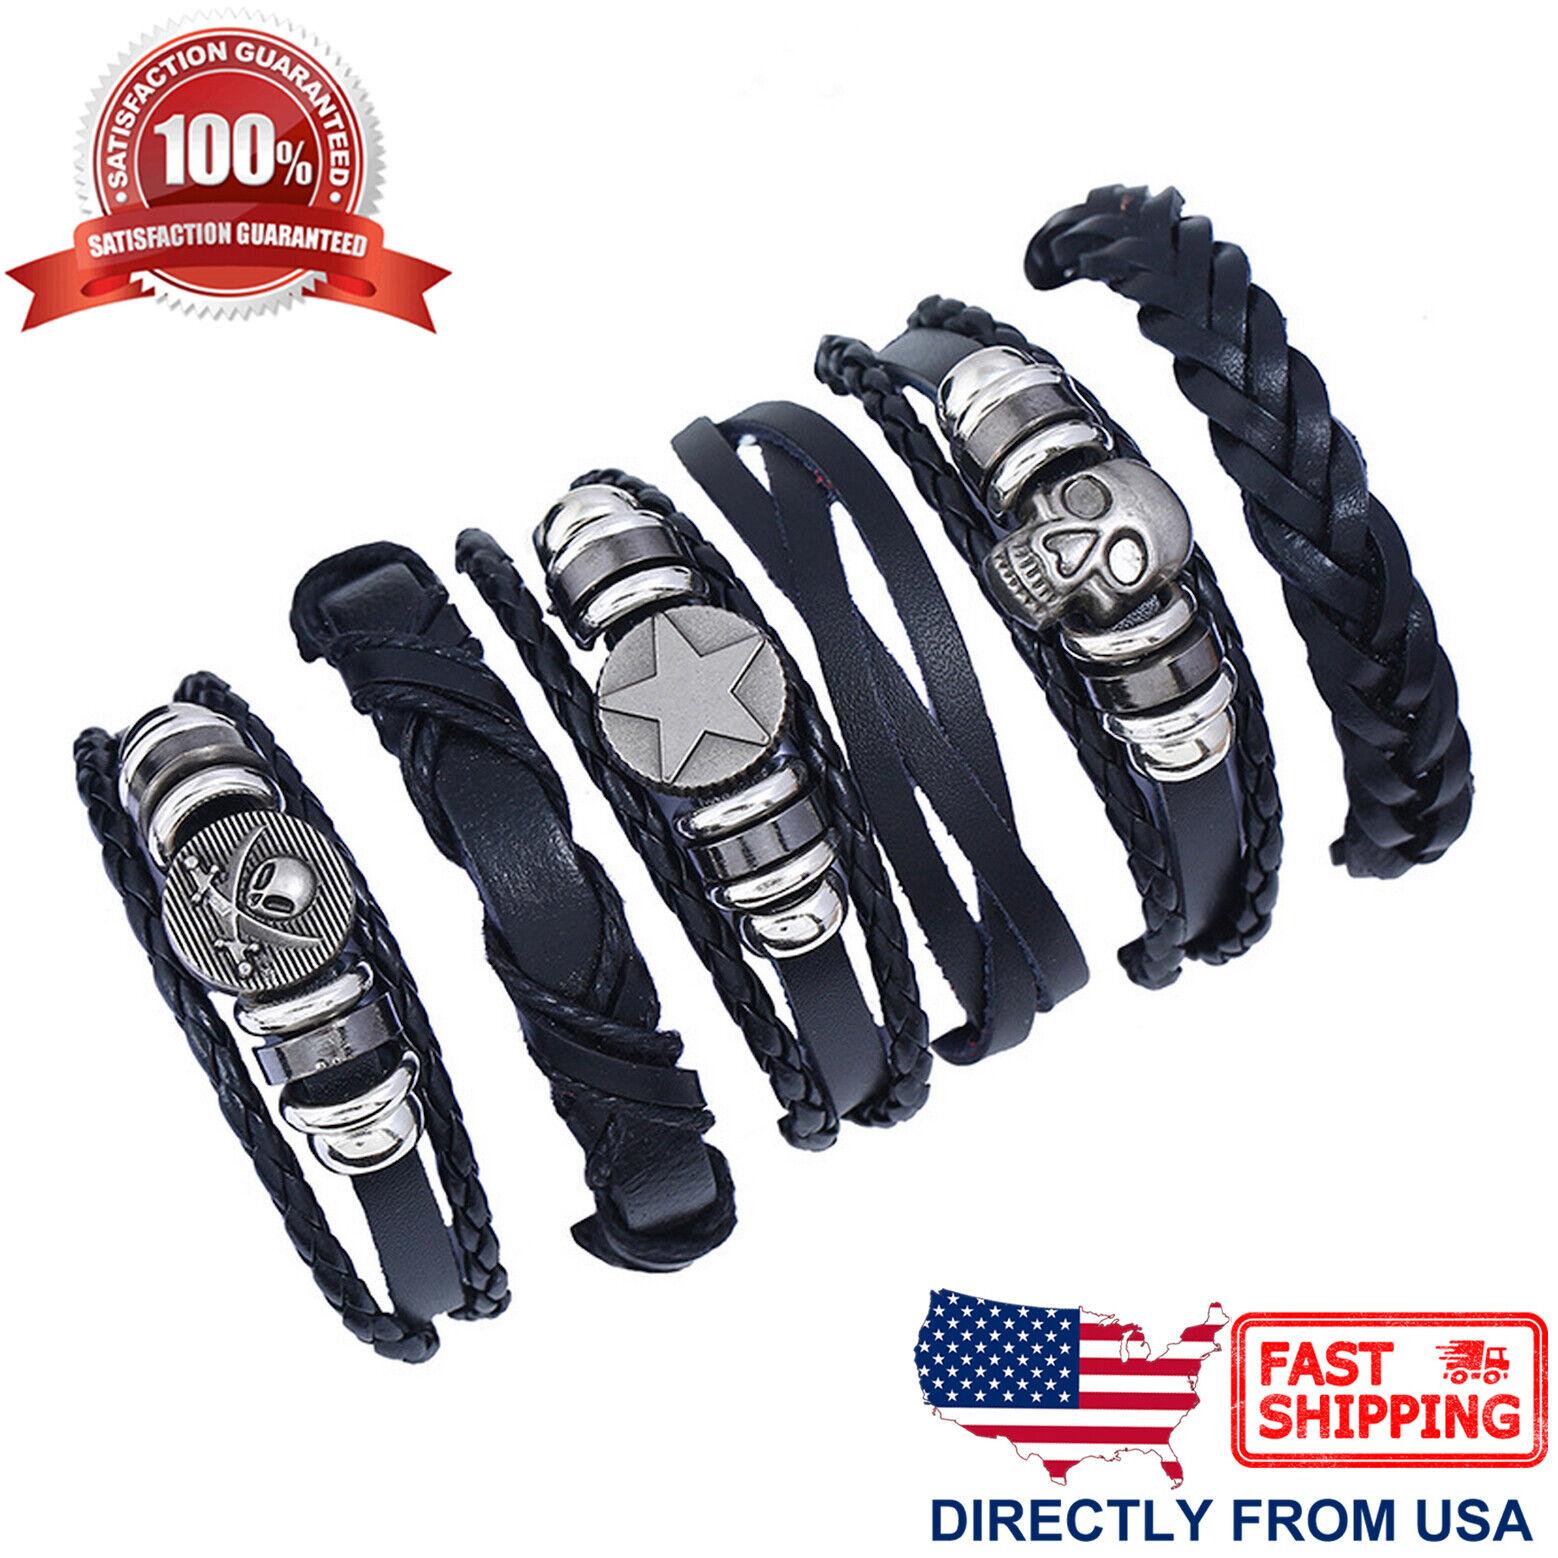 Men's Punk Rock Skull Braided Black Leather Cuff Wristband Bracelet 6pcs Set Bracelets